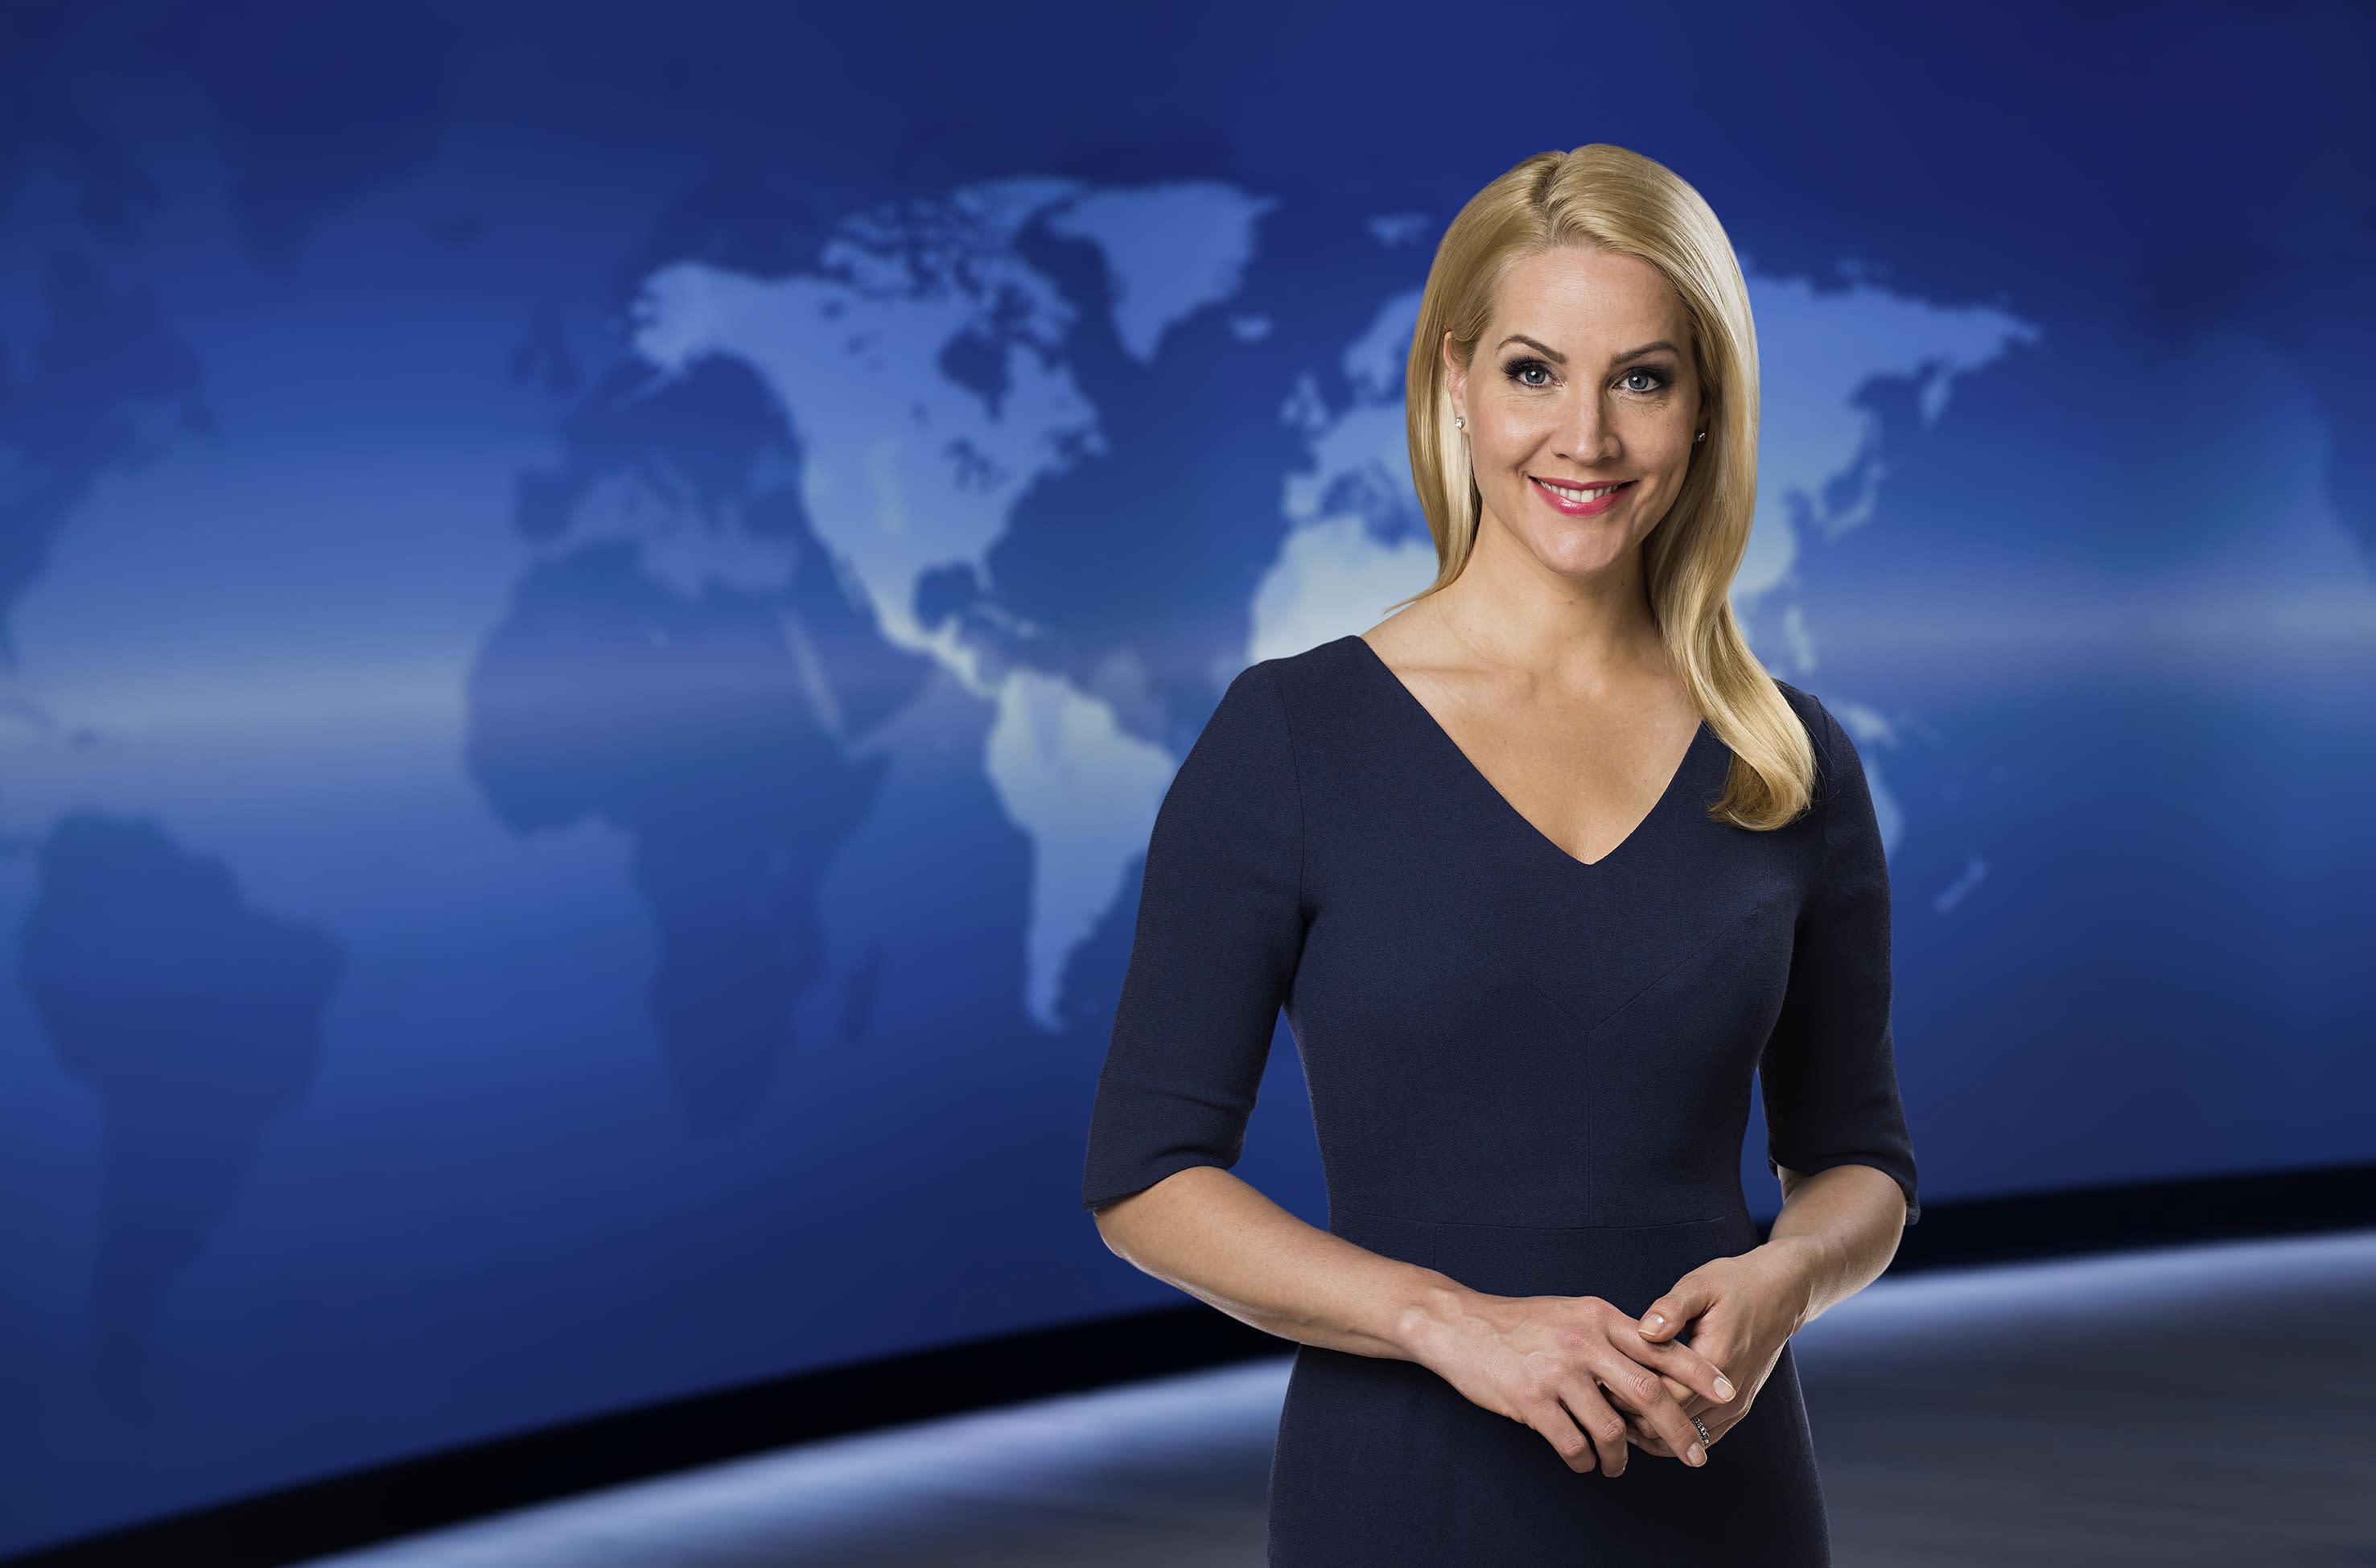 Tagesschau-Sprecherin Judith Rakers zeigt sich ungeschminkt